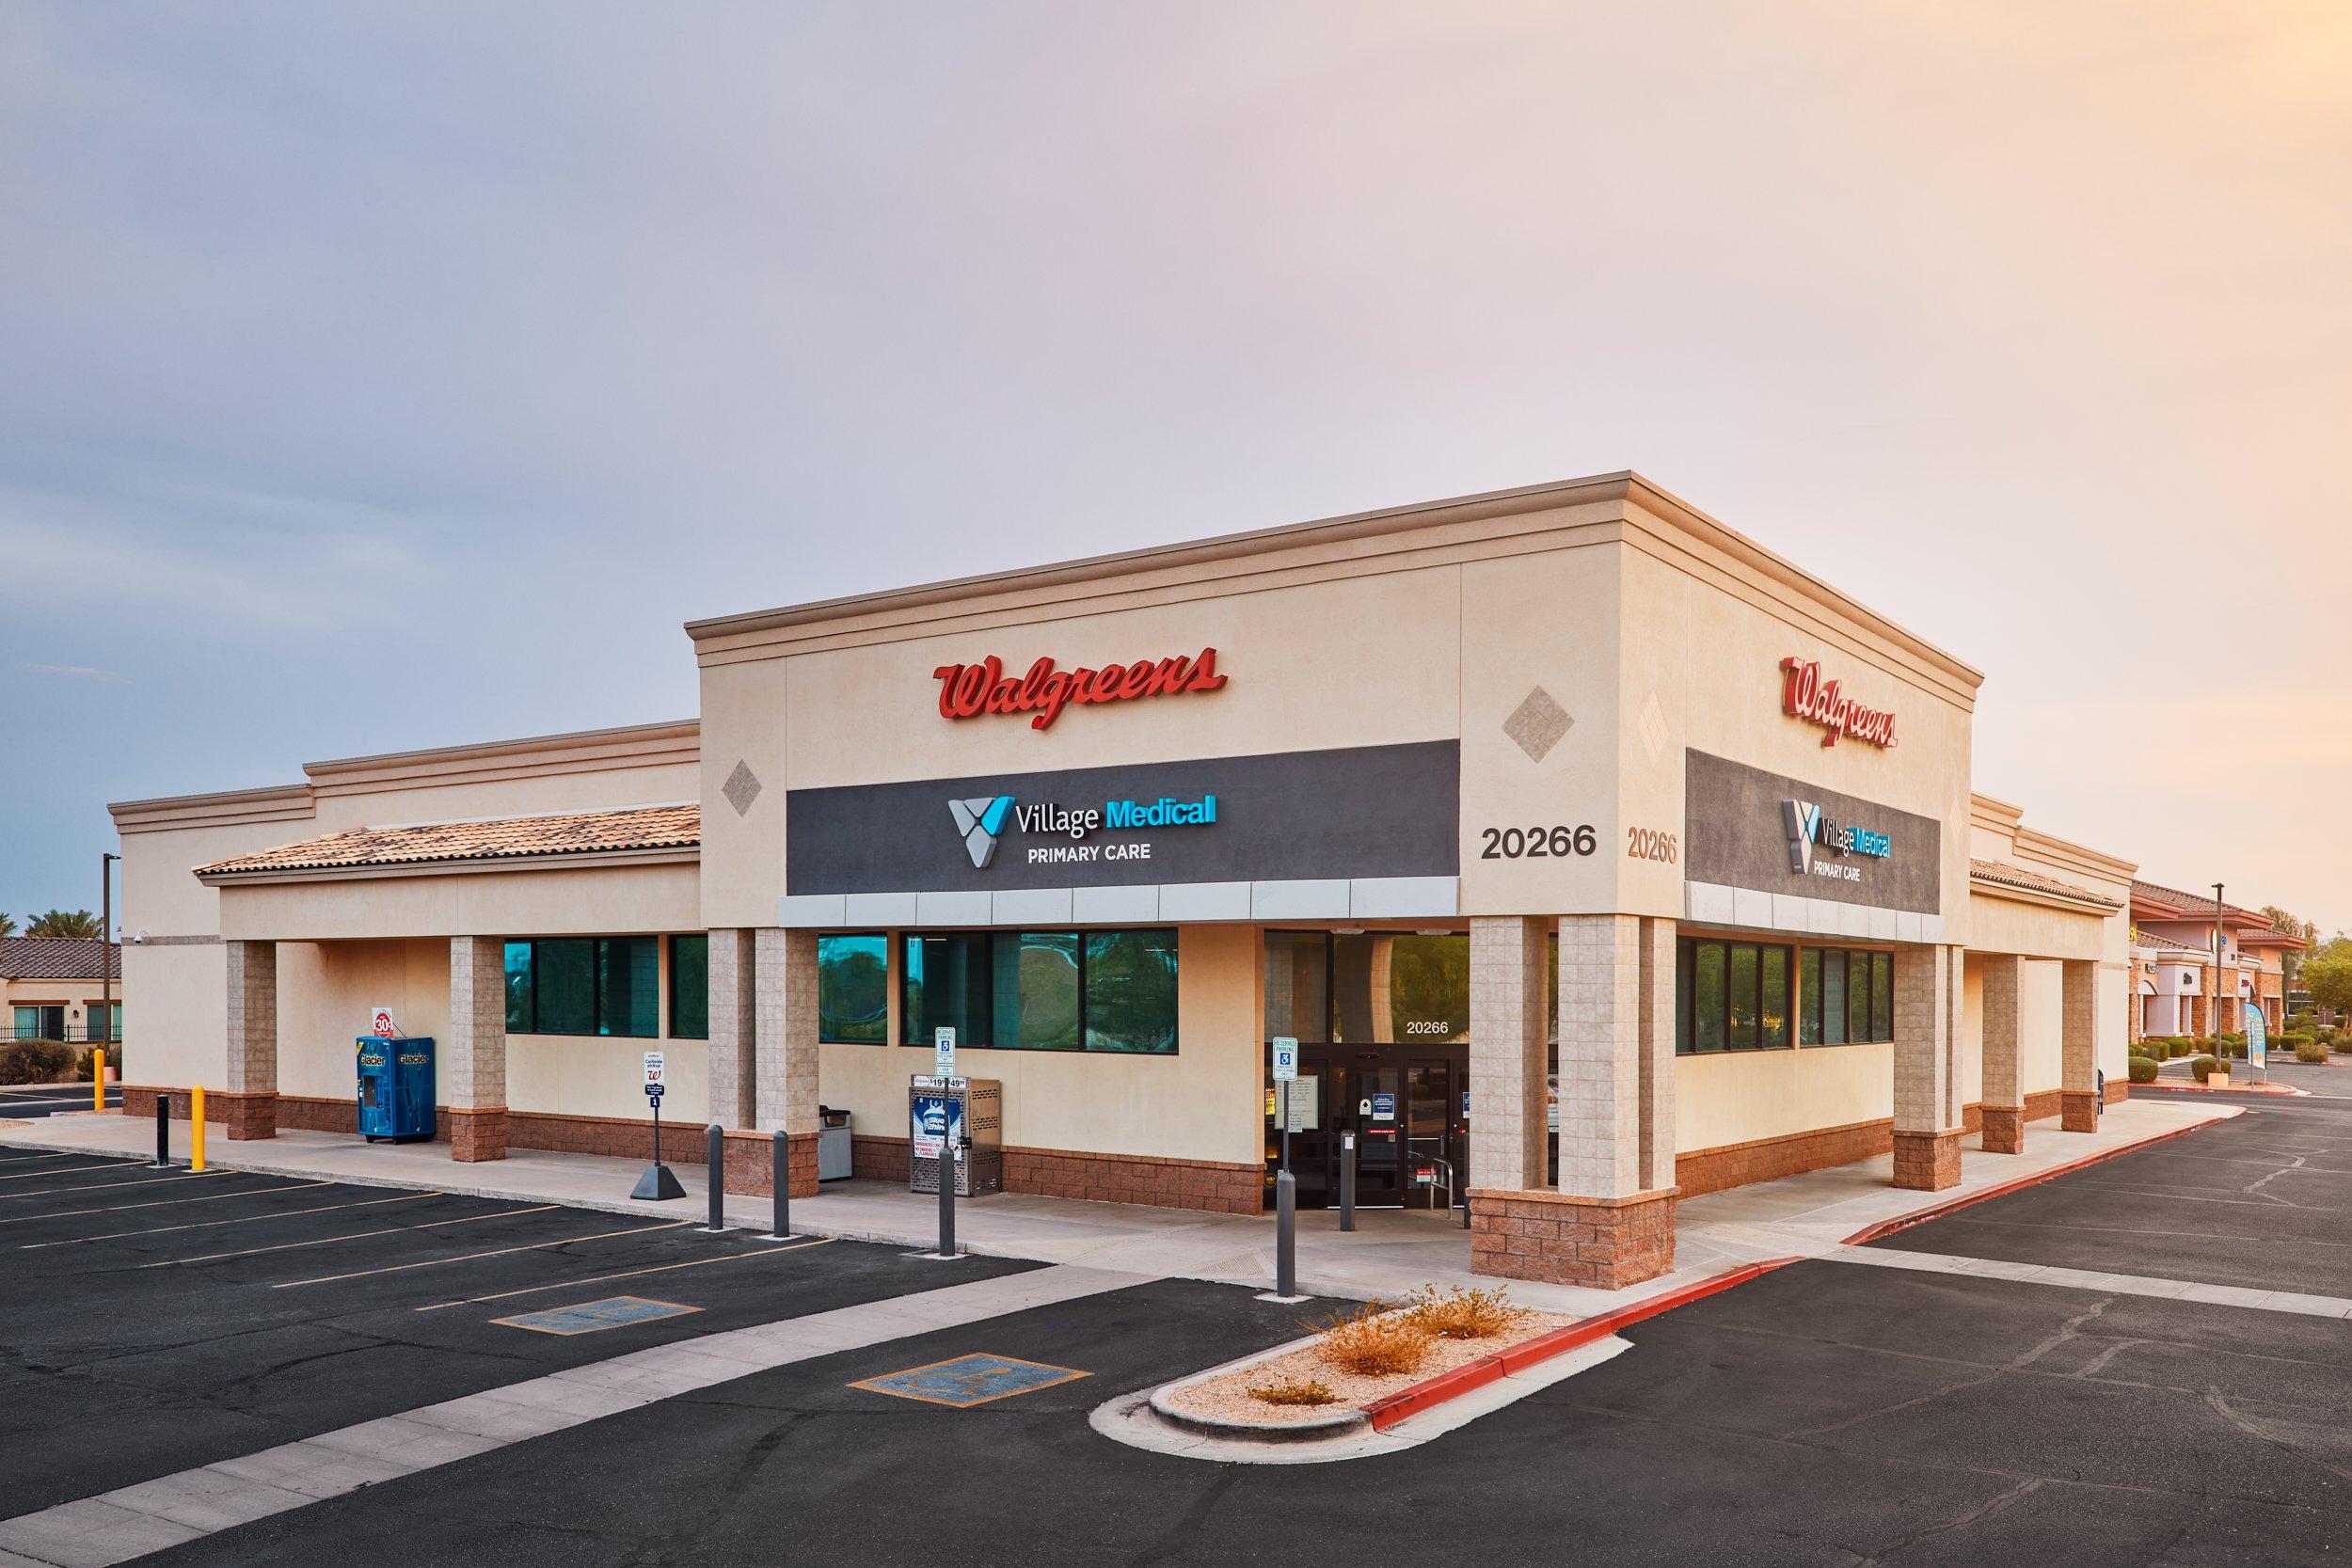 Village Medical at Walgreens - 20266 N. Lake Pleasant Rd.  Ste. 105 Peoria, AZ 85382